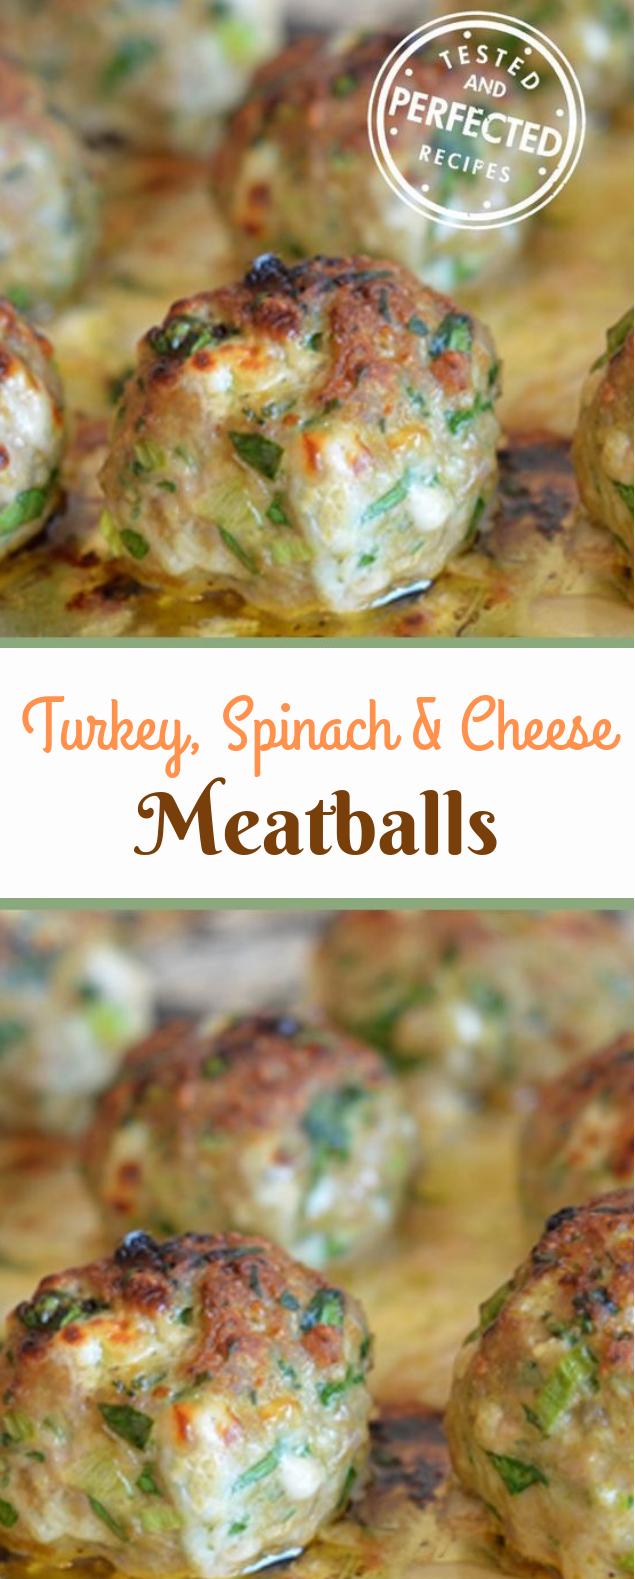 Turkey, Spinach & Cheese Meatballs #sidedish #dinner